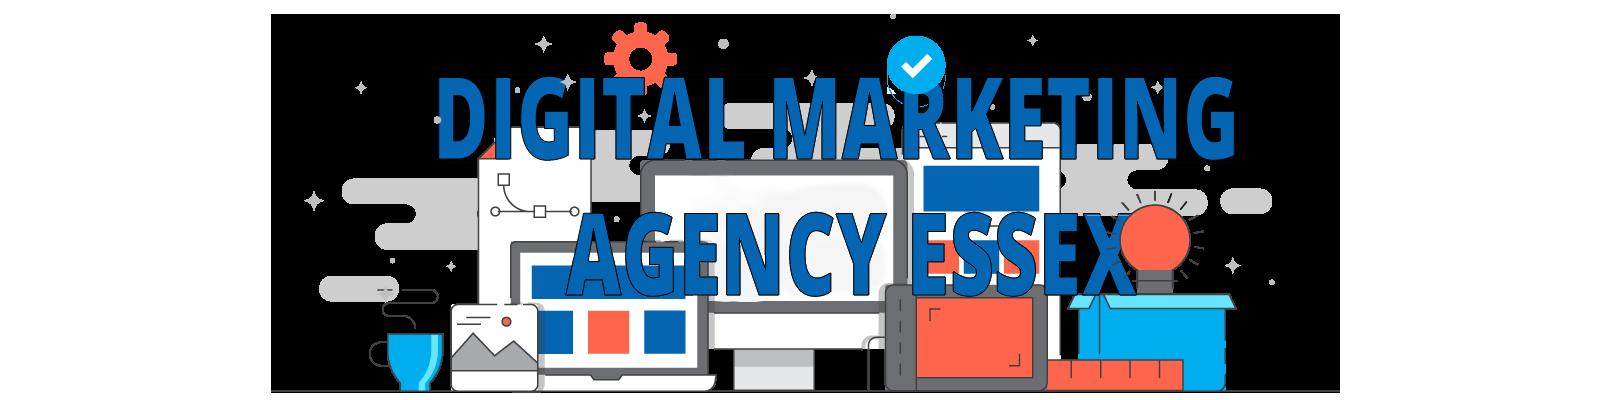 digital marketing agency essex header with transparent background